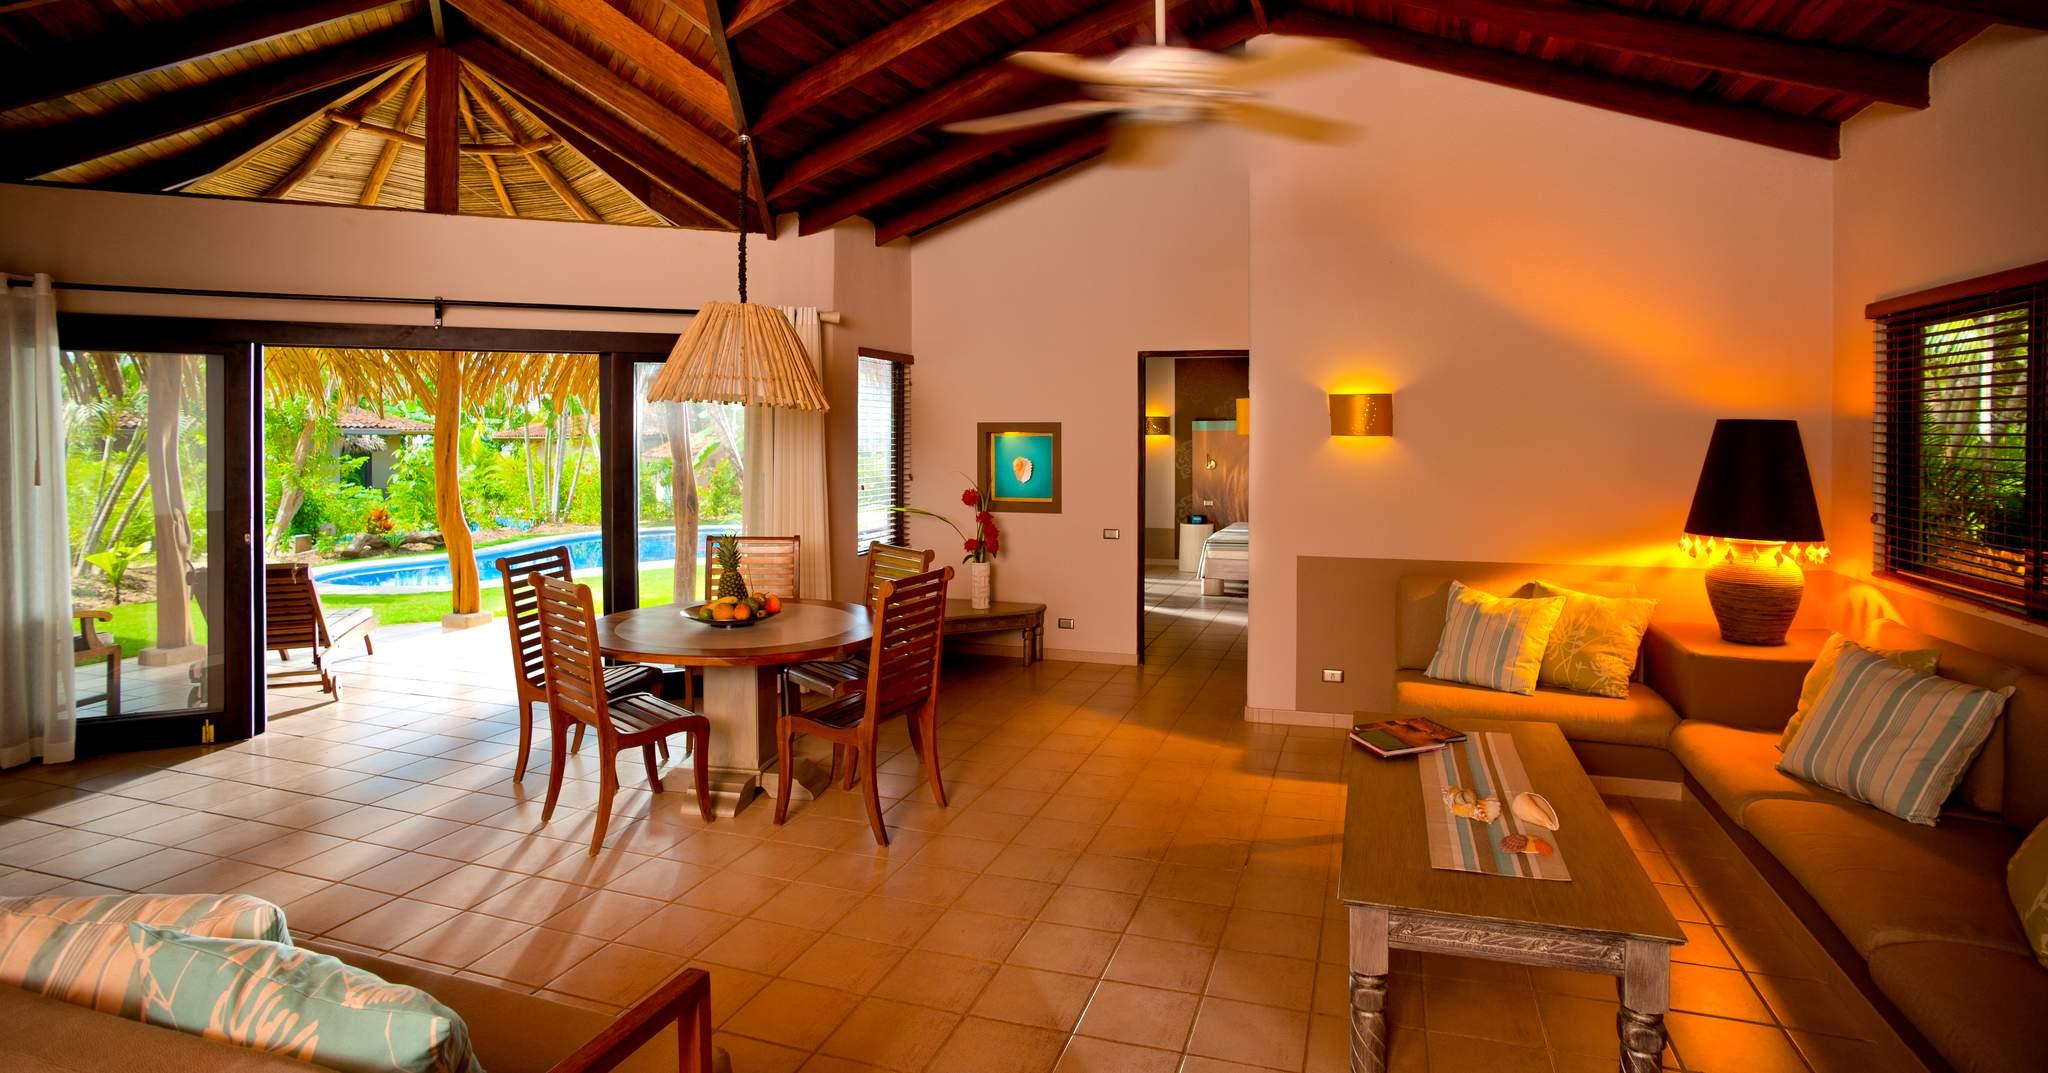 Cala luna boutique hotel villas in tamarindo costa rica for Boutique hotel uzuri villa